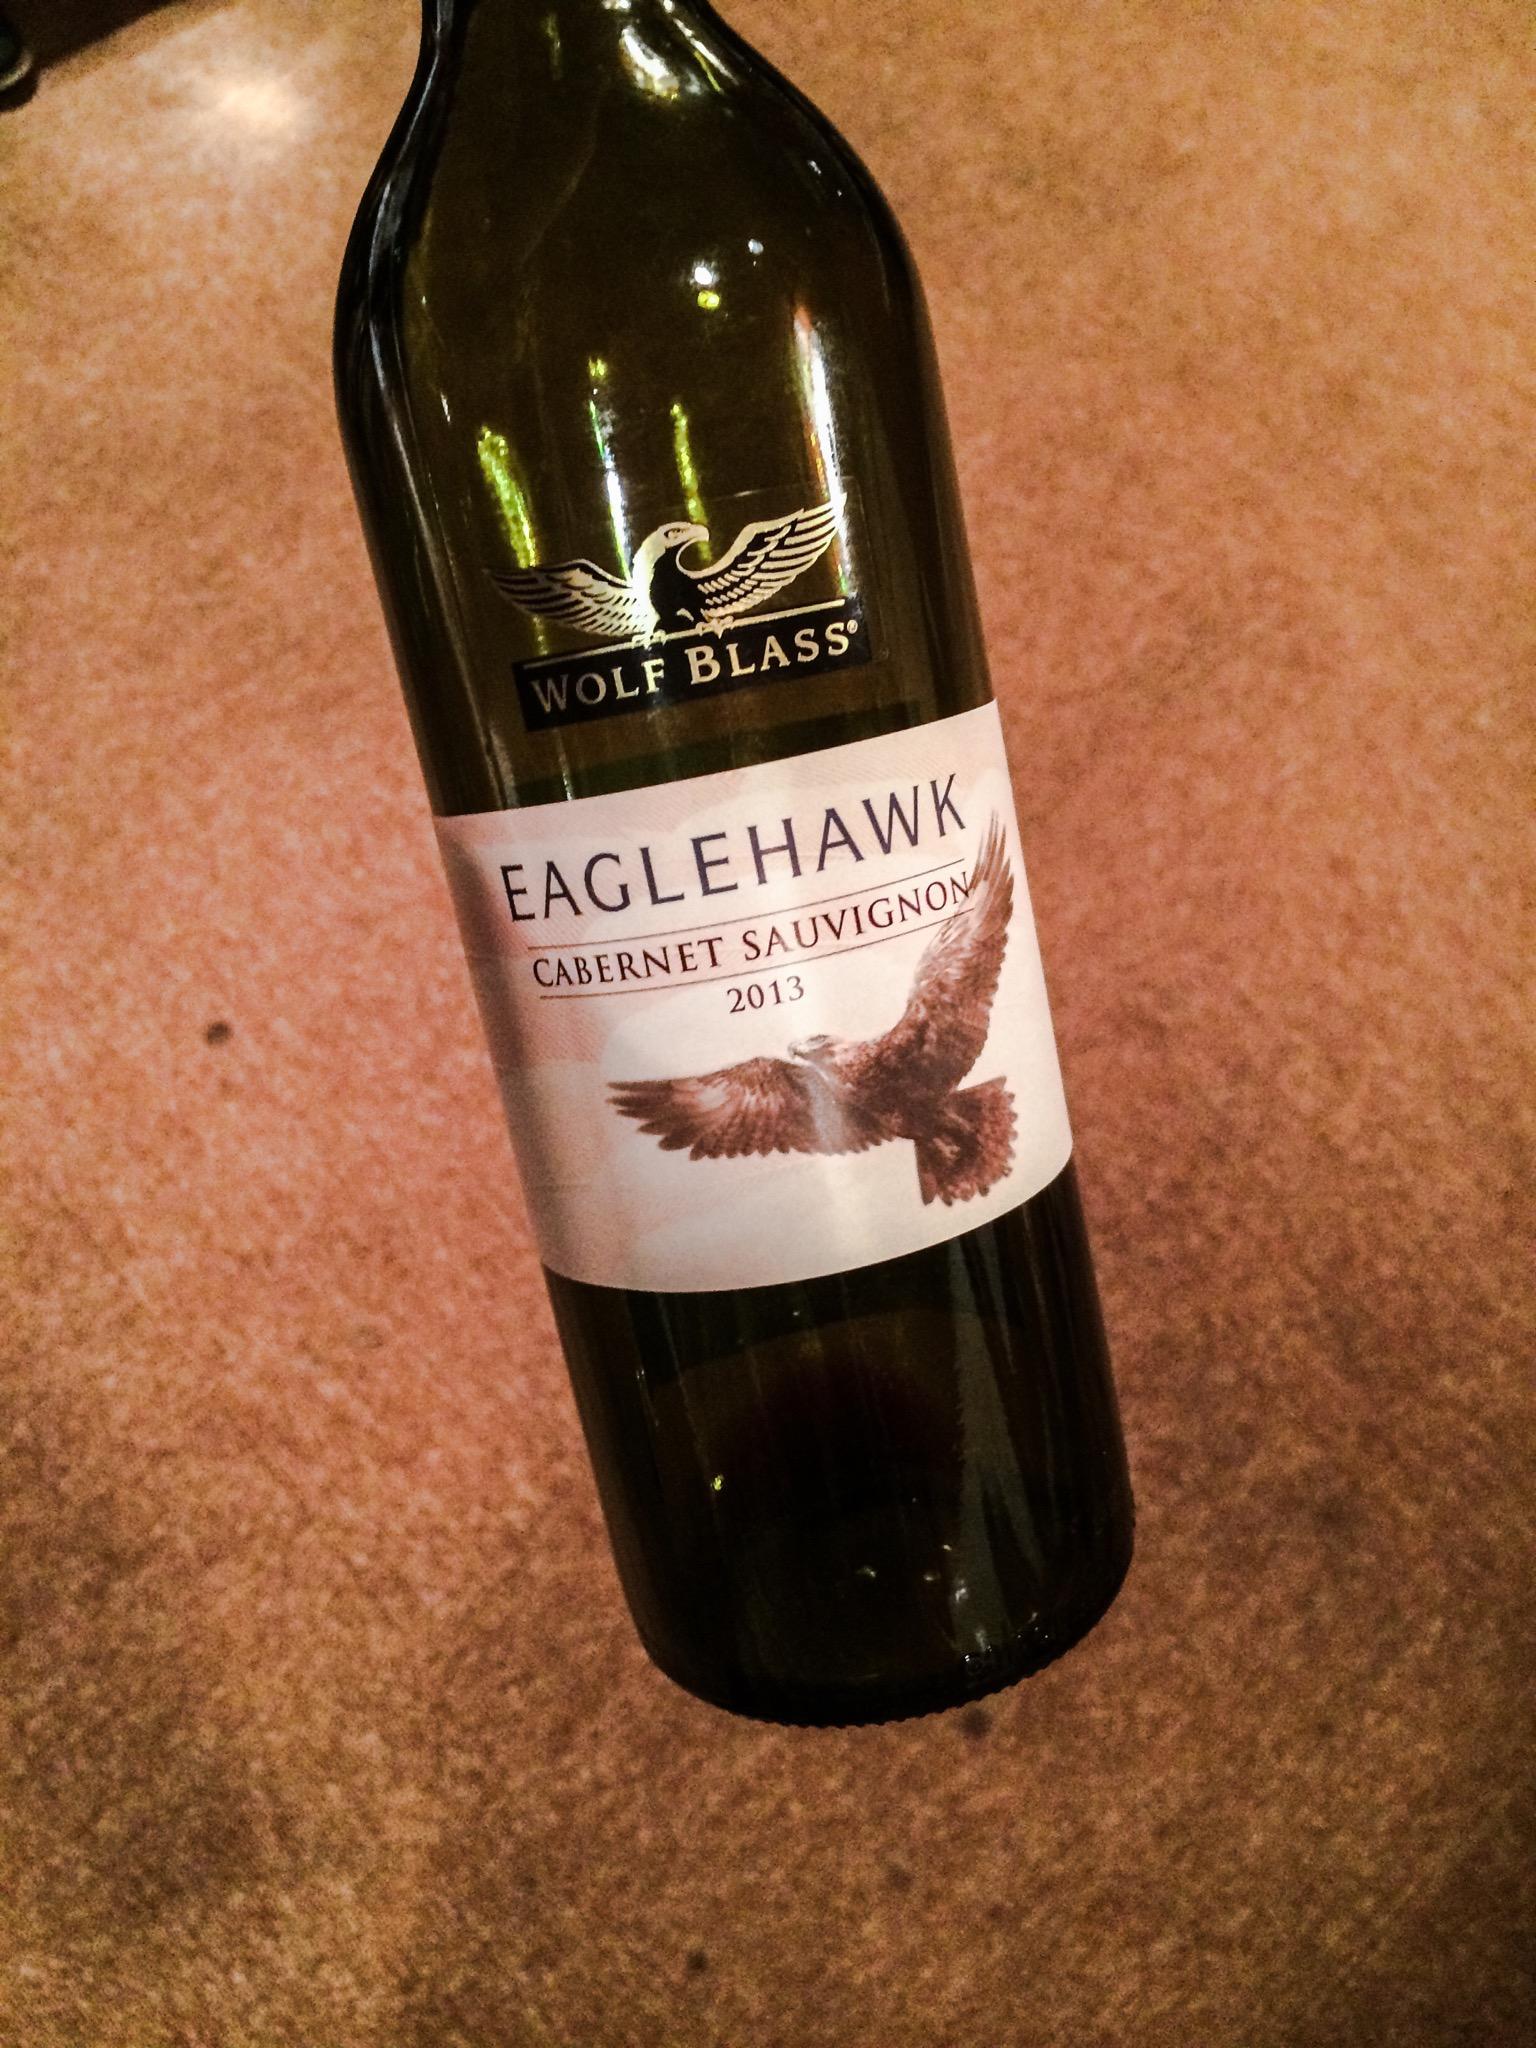 Wolf Blass Eaglehawk Cabernet Sauvignon, 2013